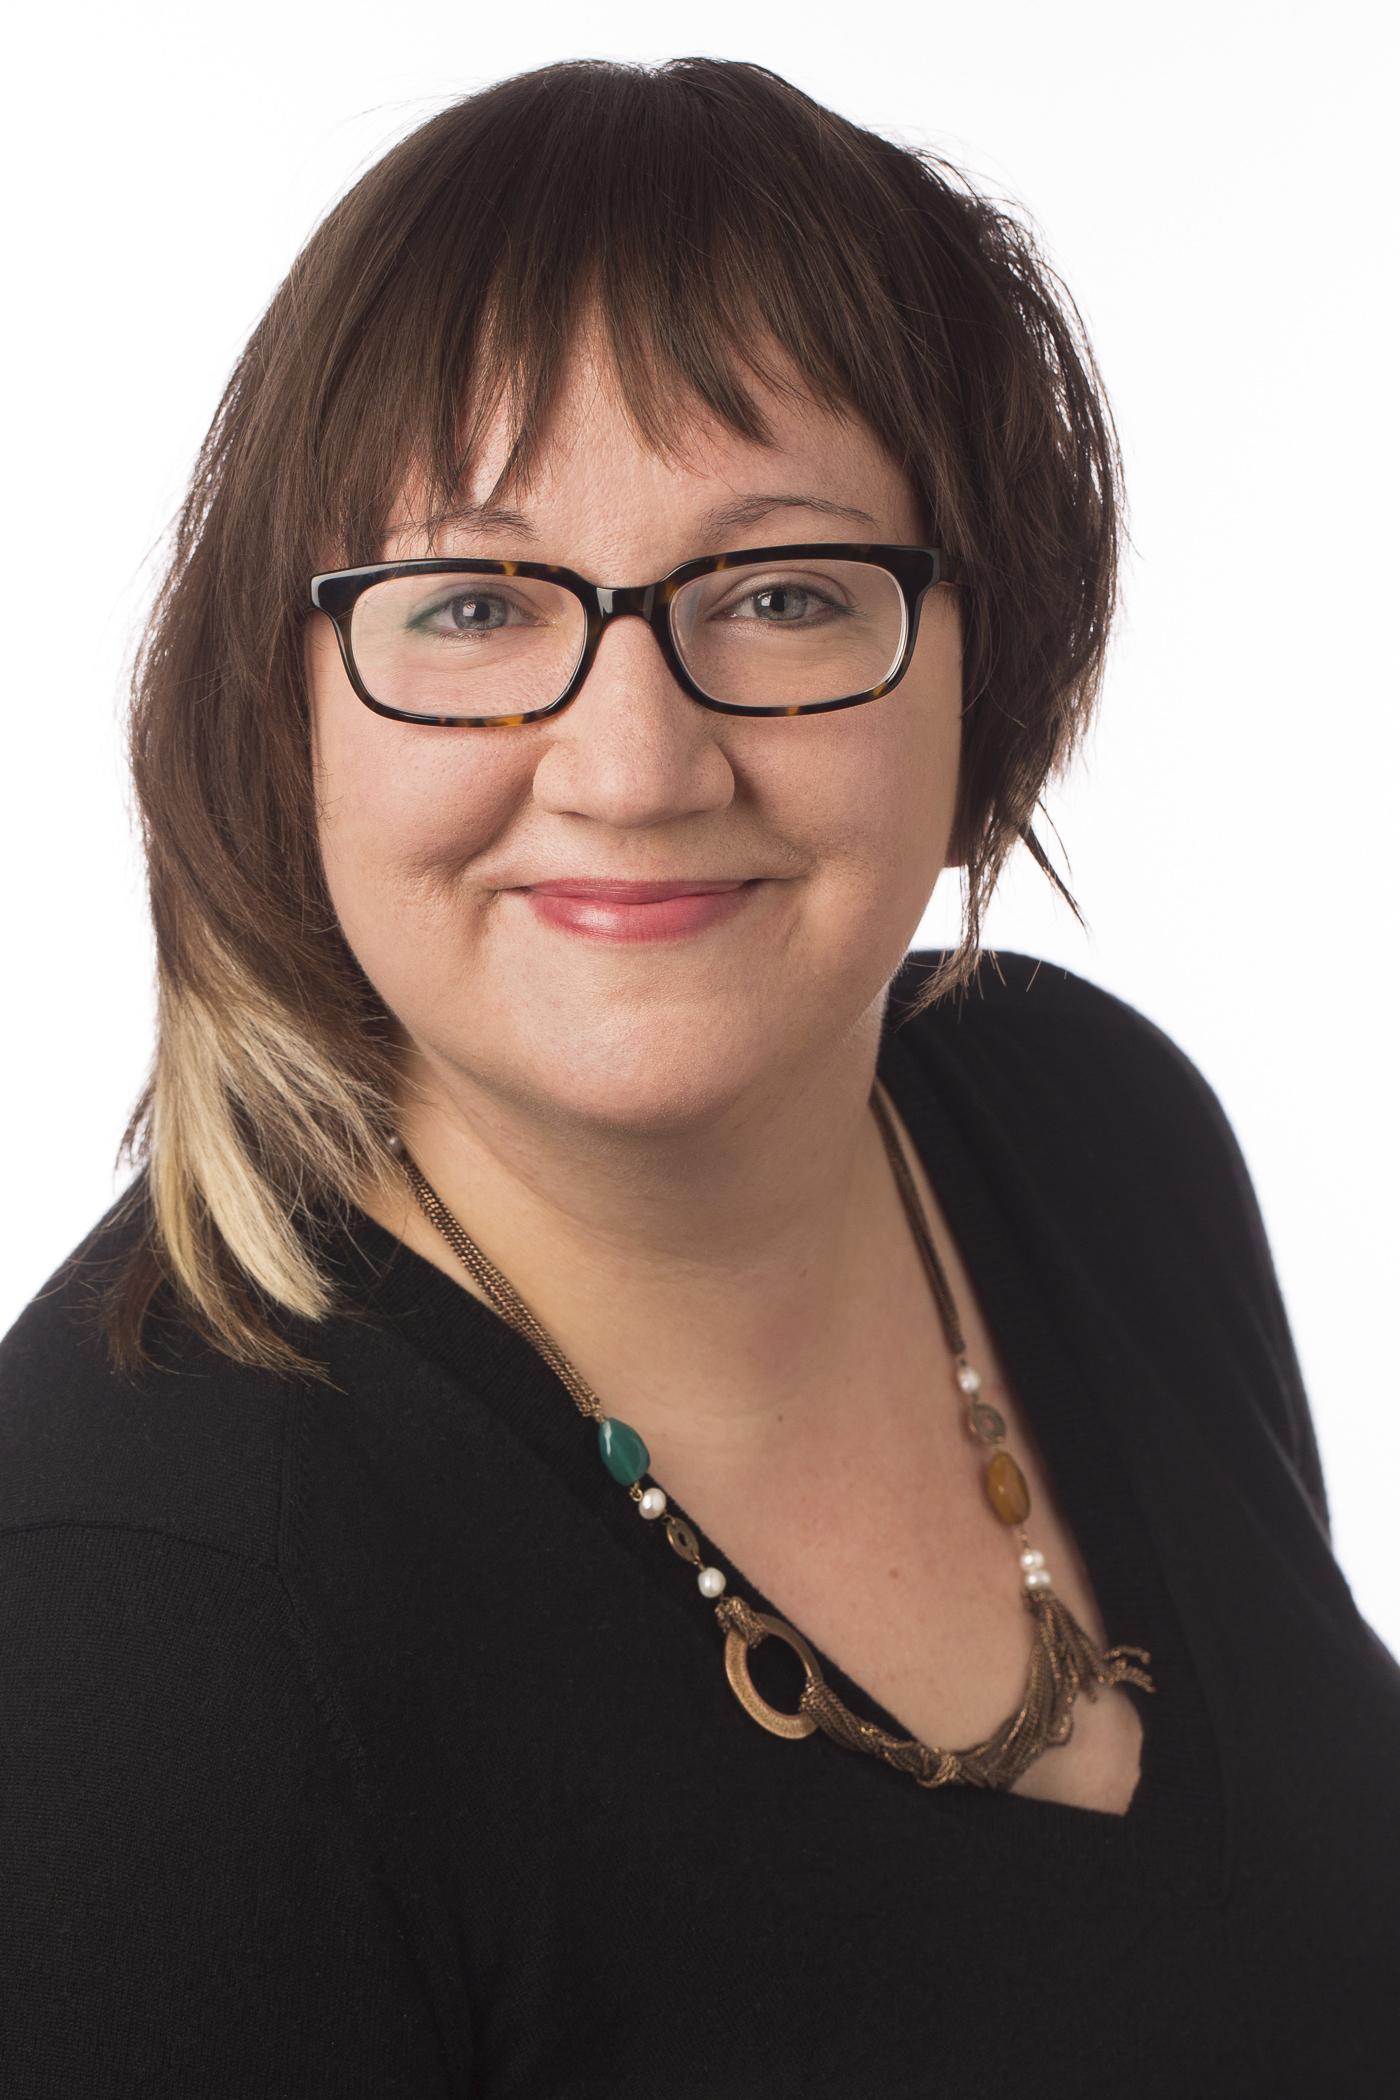 Molly Michal - Community Curator